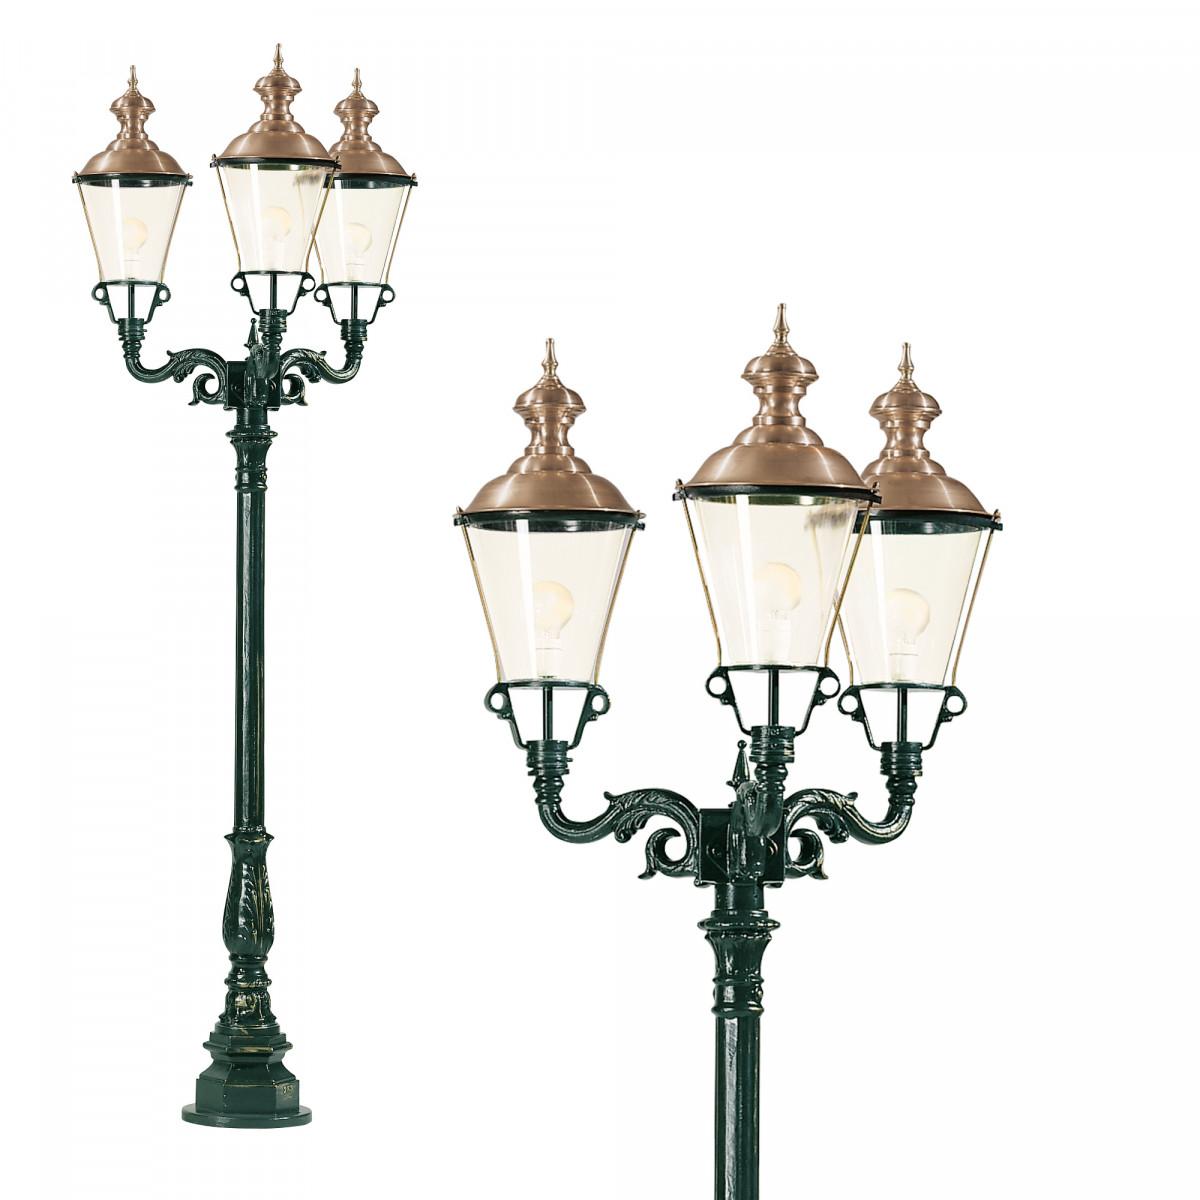 Parijs (403) - KS Verlichting - Buitenverlichting Rond